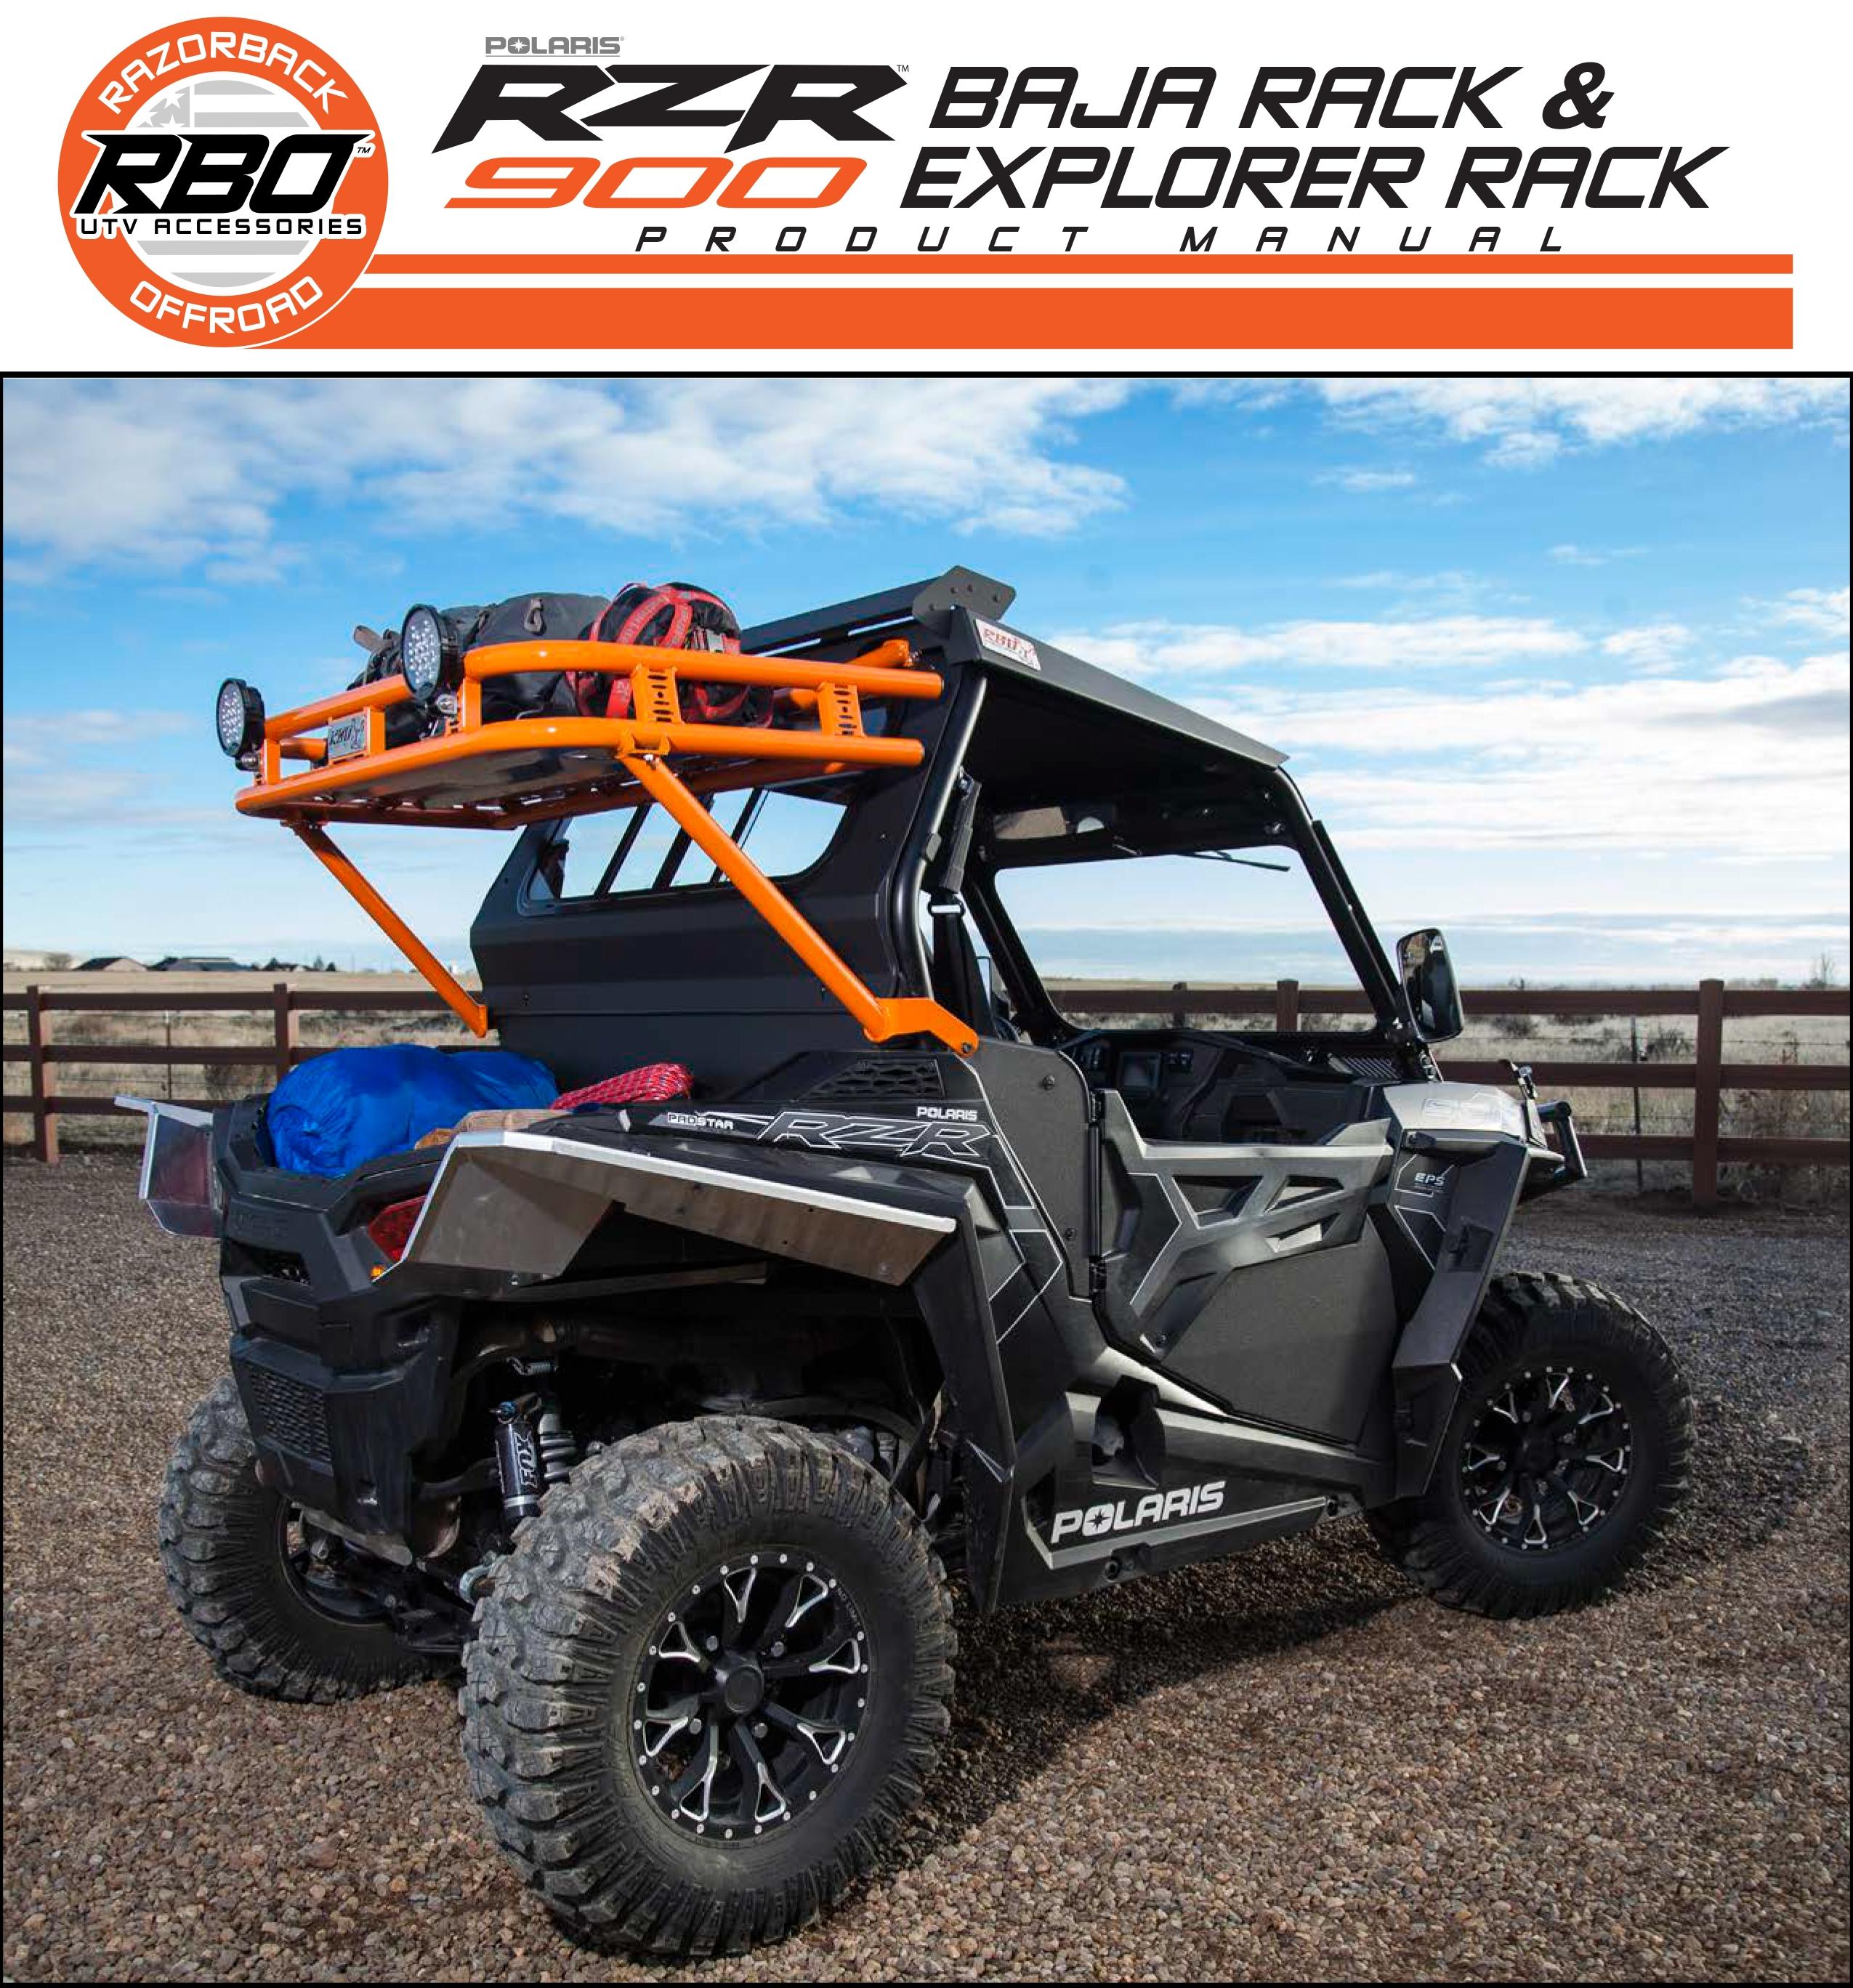 RBO Polaris RZR 900 Baja and Explorer Racks Product Manual